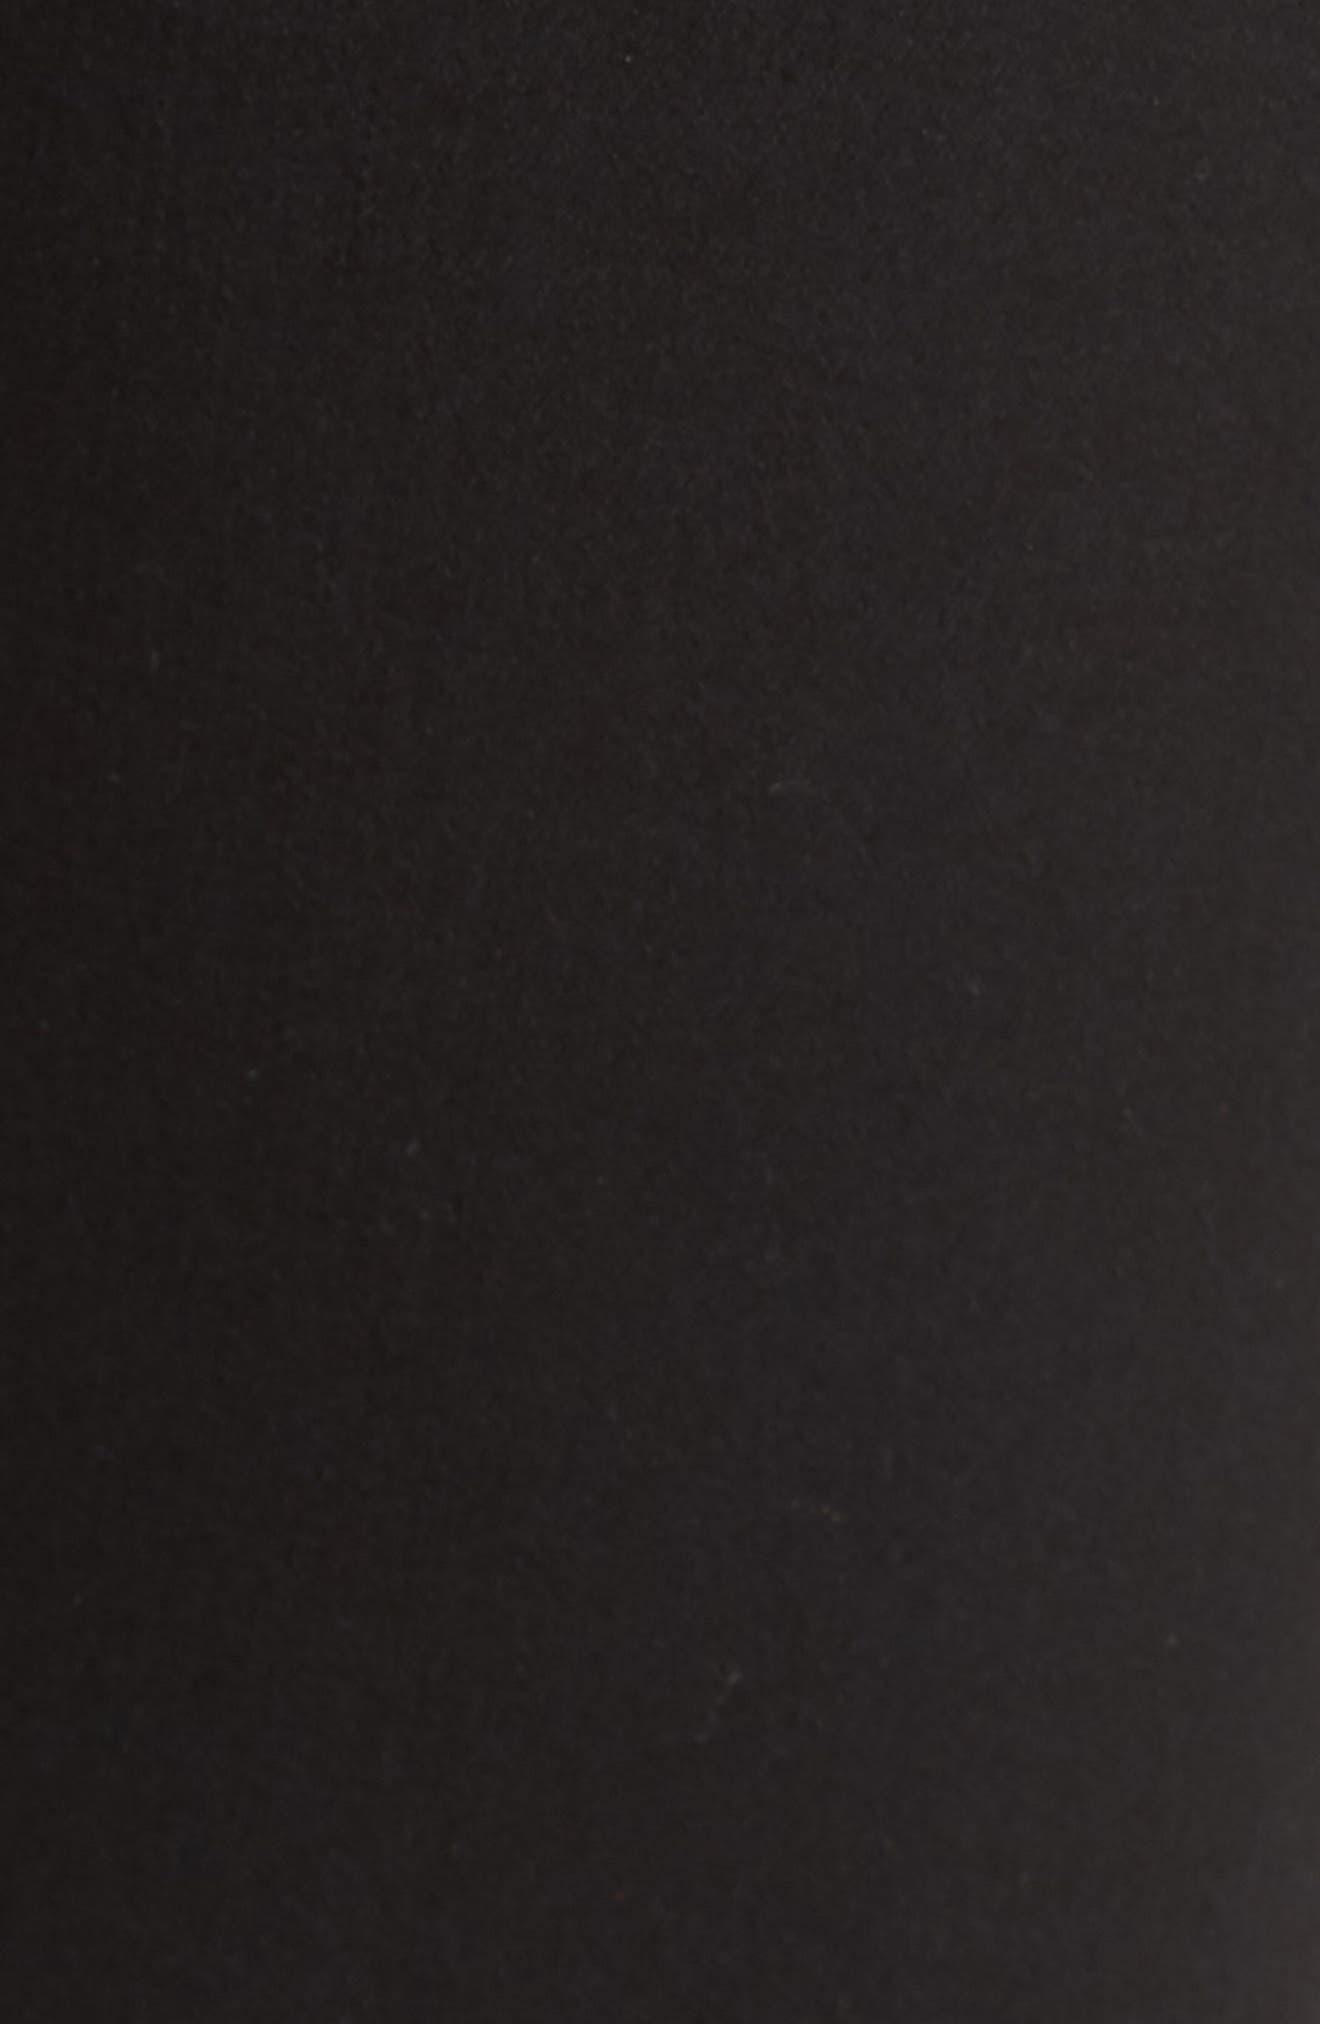 Jamie Ripped Jeans,                             Alternate thumbnail 6, color,                             Black